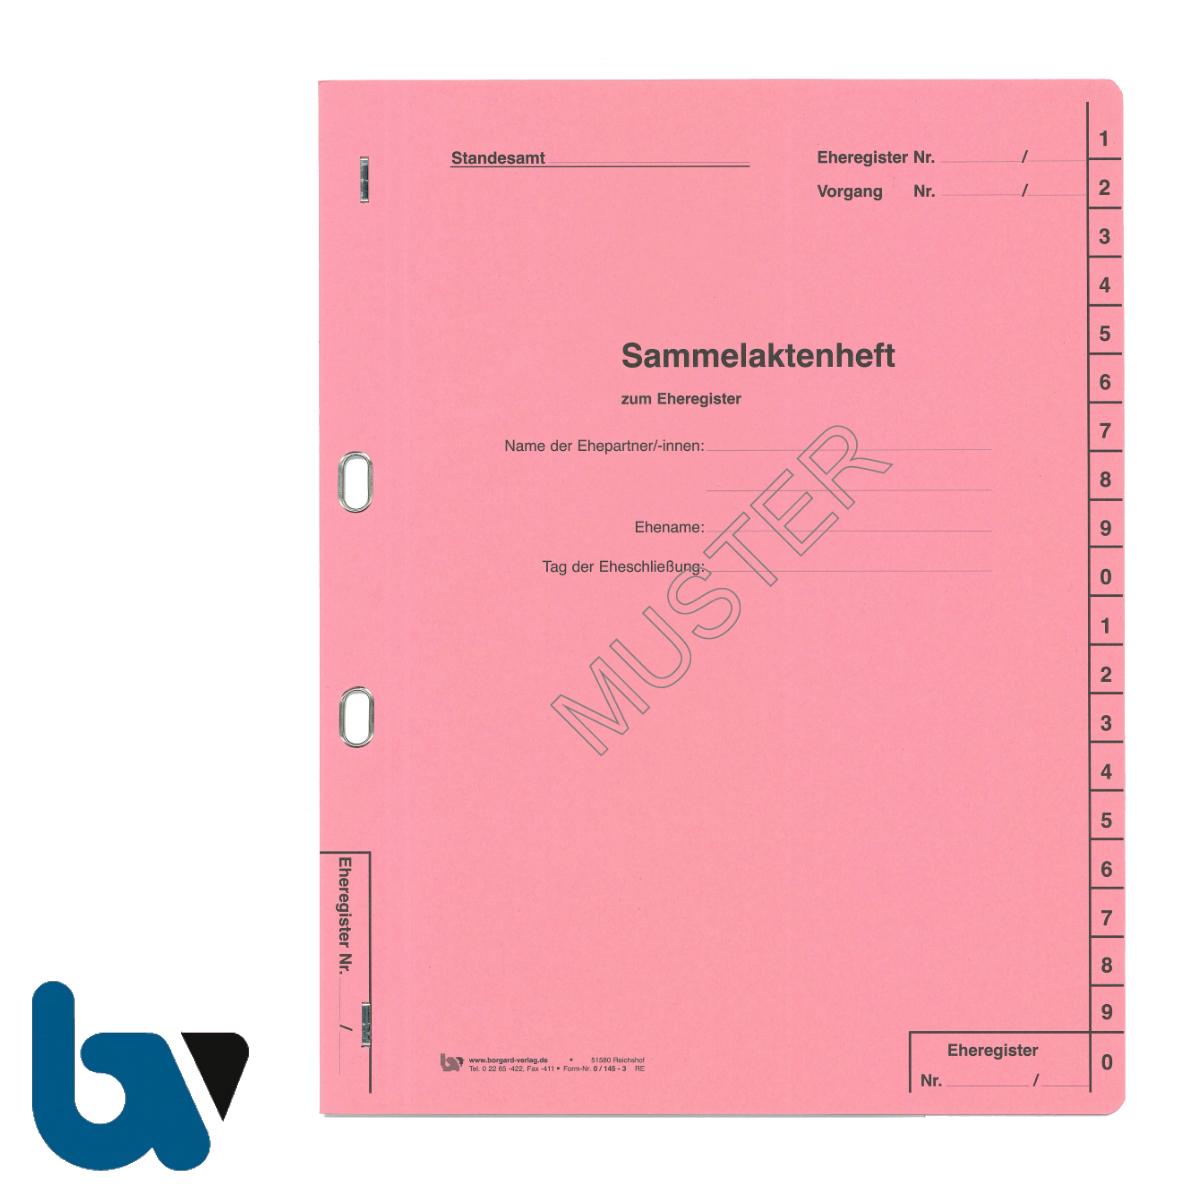 0/145-3 Sammelaktenheft Eheregister Ehepartner Eheschliessung Ovalöse beidseitig rosa Karton Vorderseite | Borgard Verlag GmbH